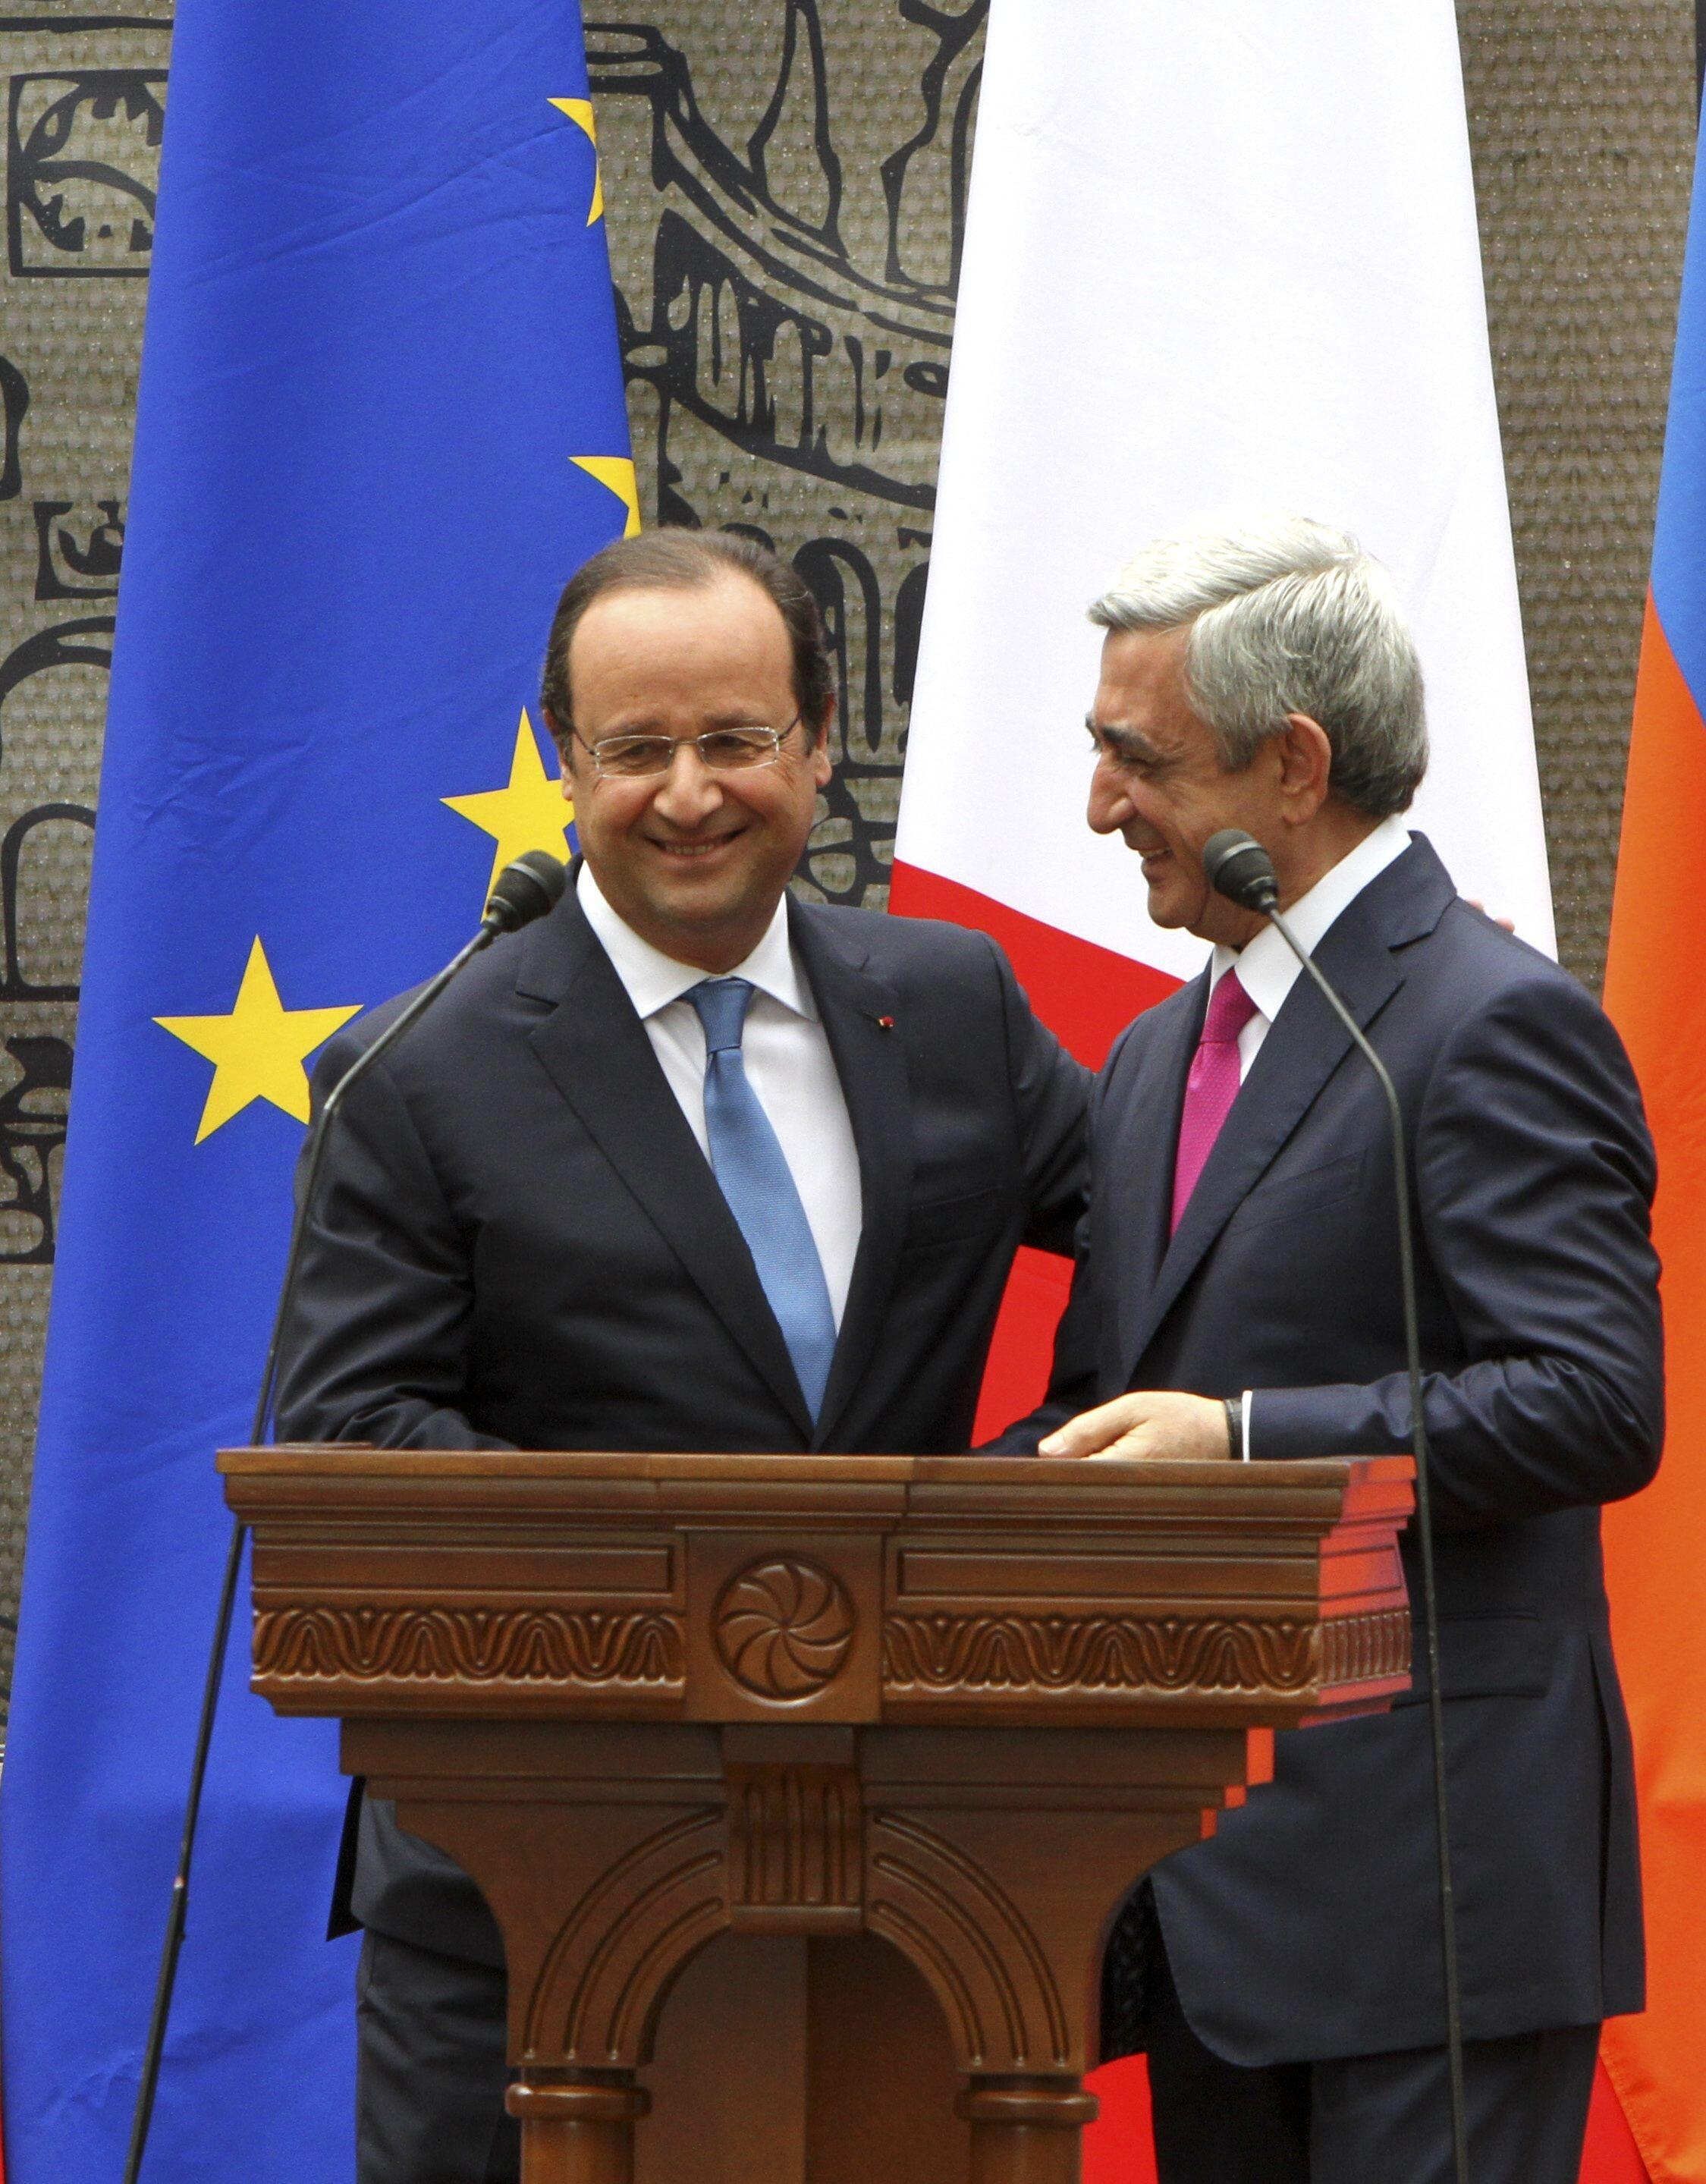 Франсуа Олланд и Серж Саргсян на церемонии открытия памятника франко-армянскому поэту Мисаку Манушяну в Ереване 13/05/2014